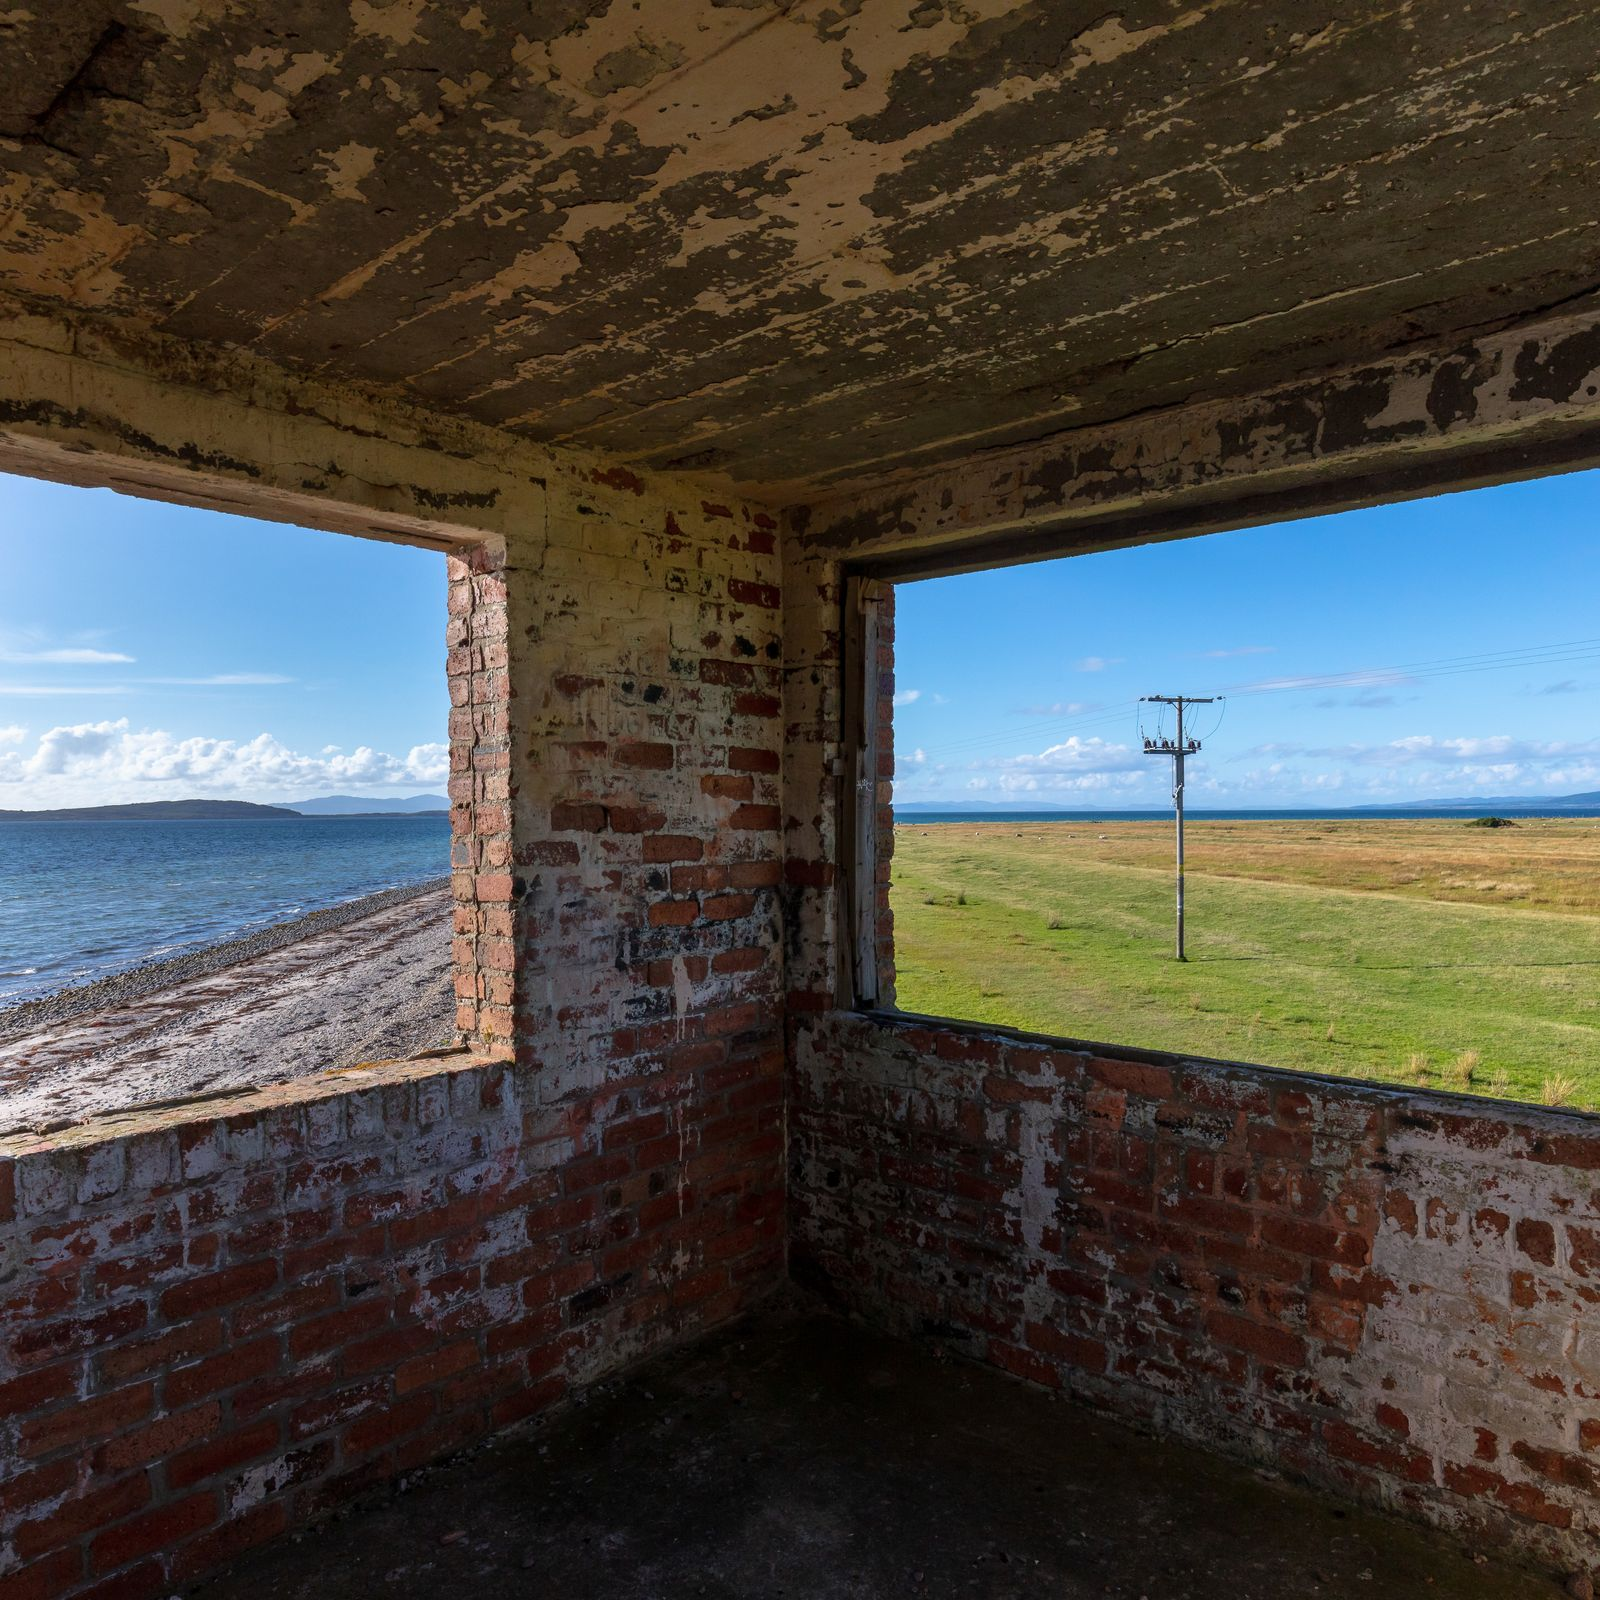 Rhunahaorine Point WW2 lookout post II, Kintyre, Argyll & Bute, Scotland.